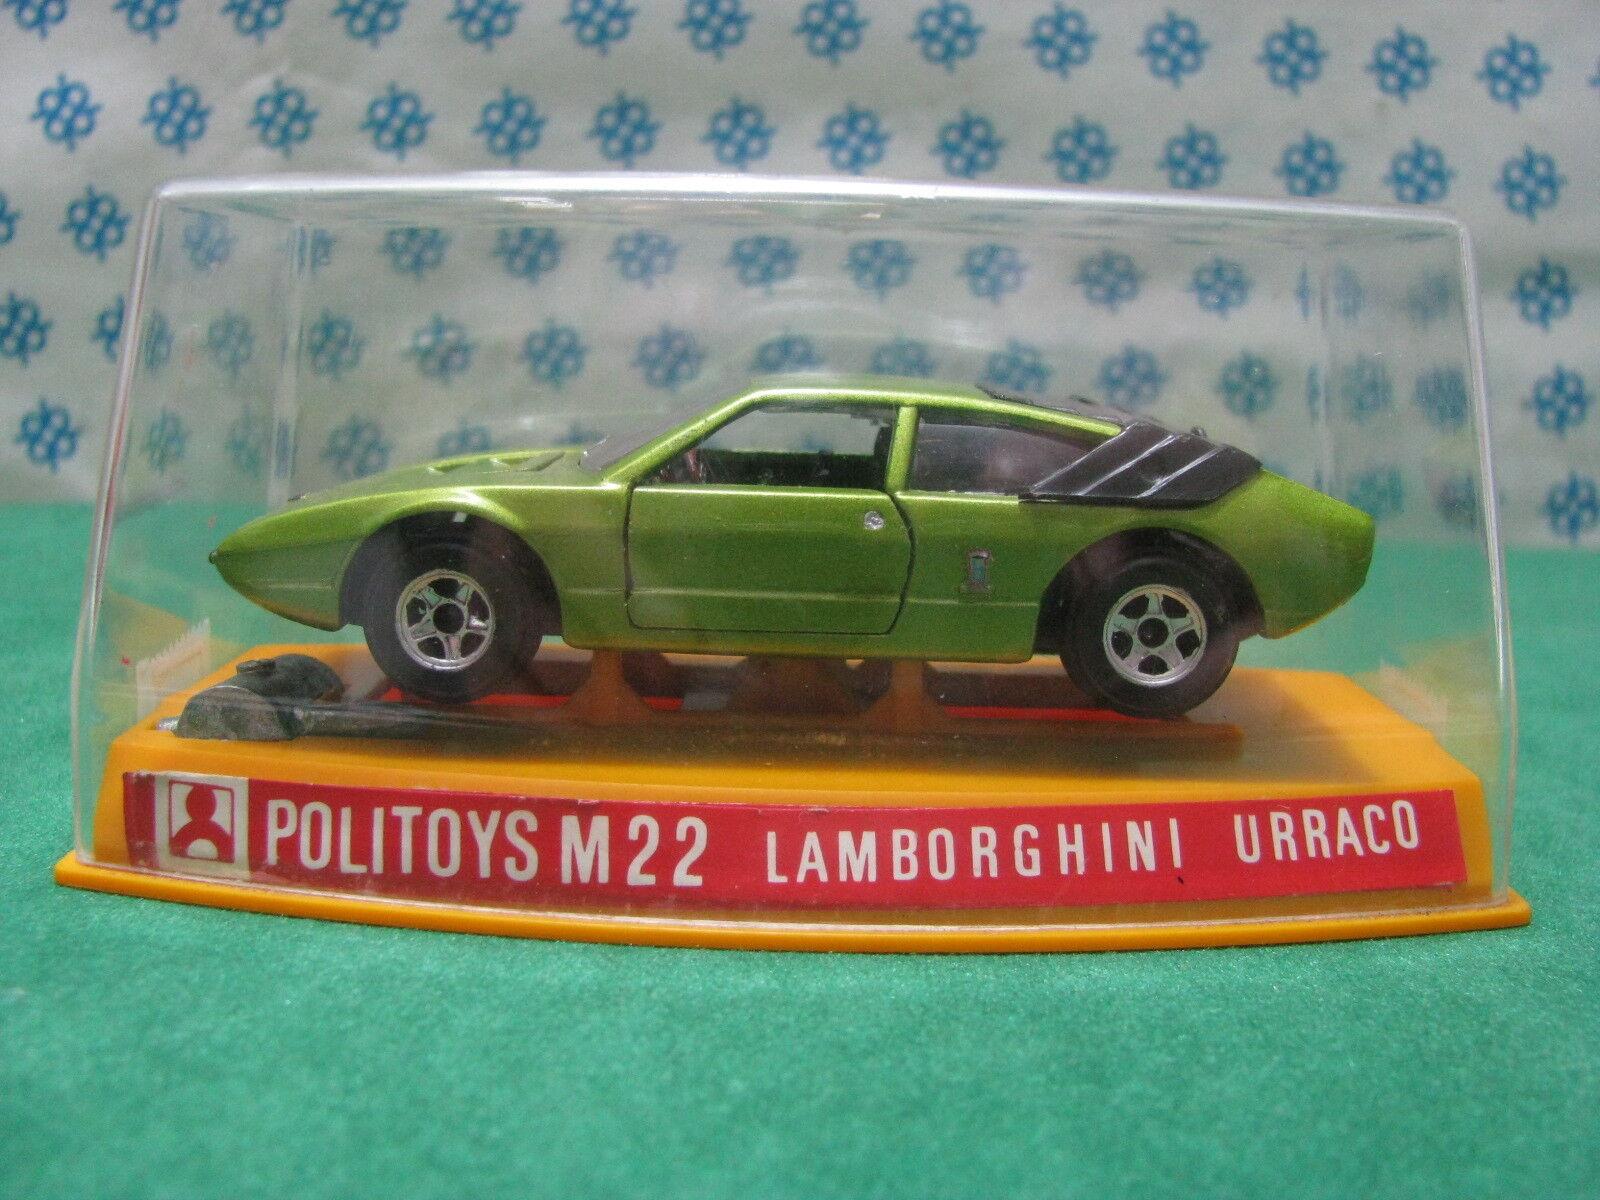 .Vintage - LAMBORGHINI URRACO - 1 43 Politoys-M22